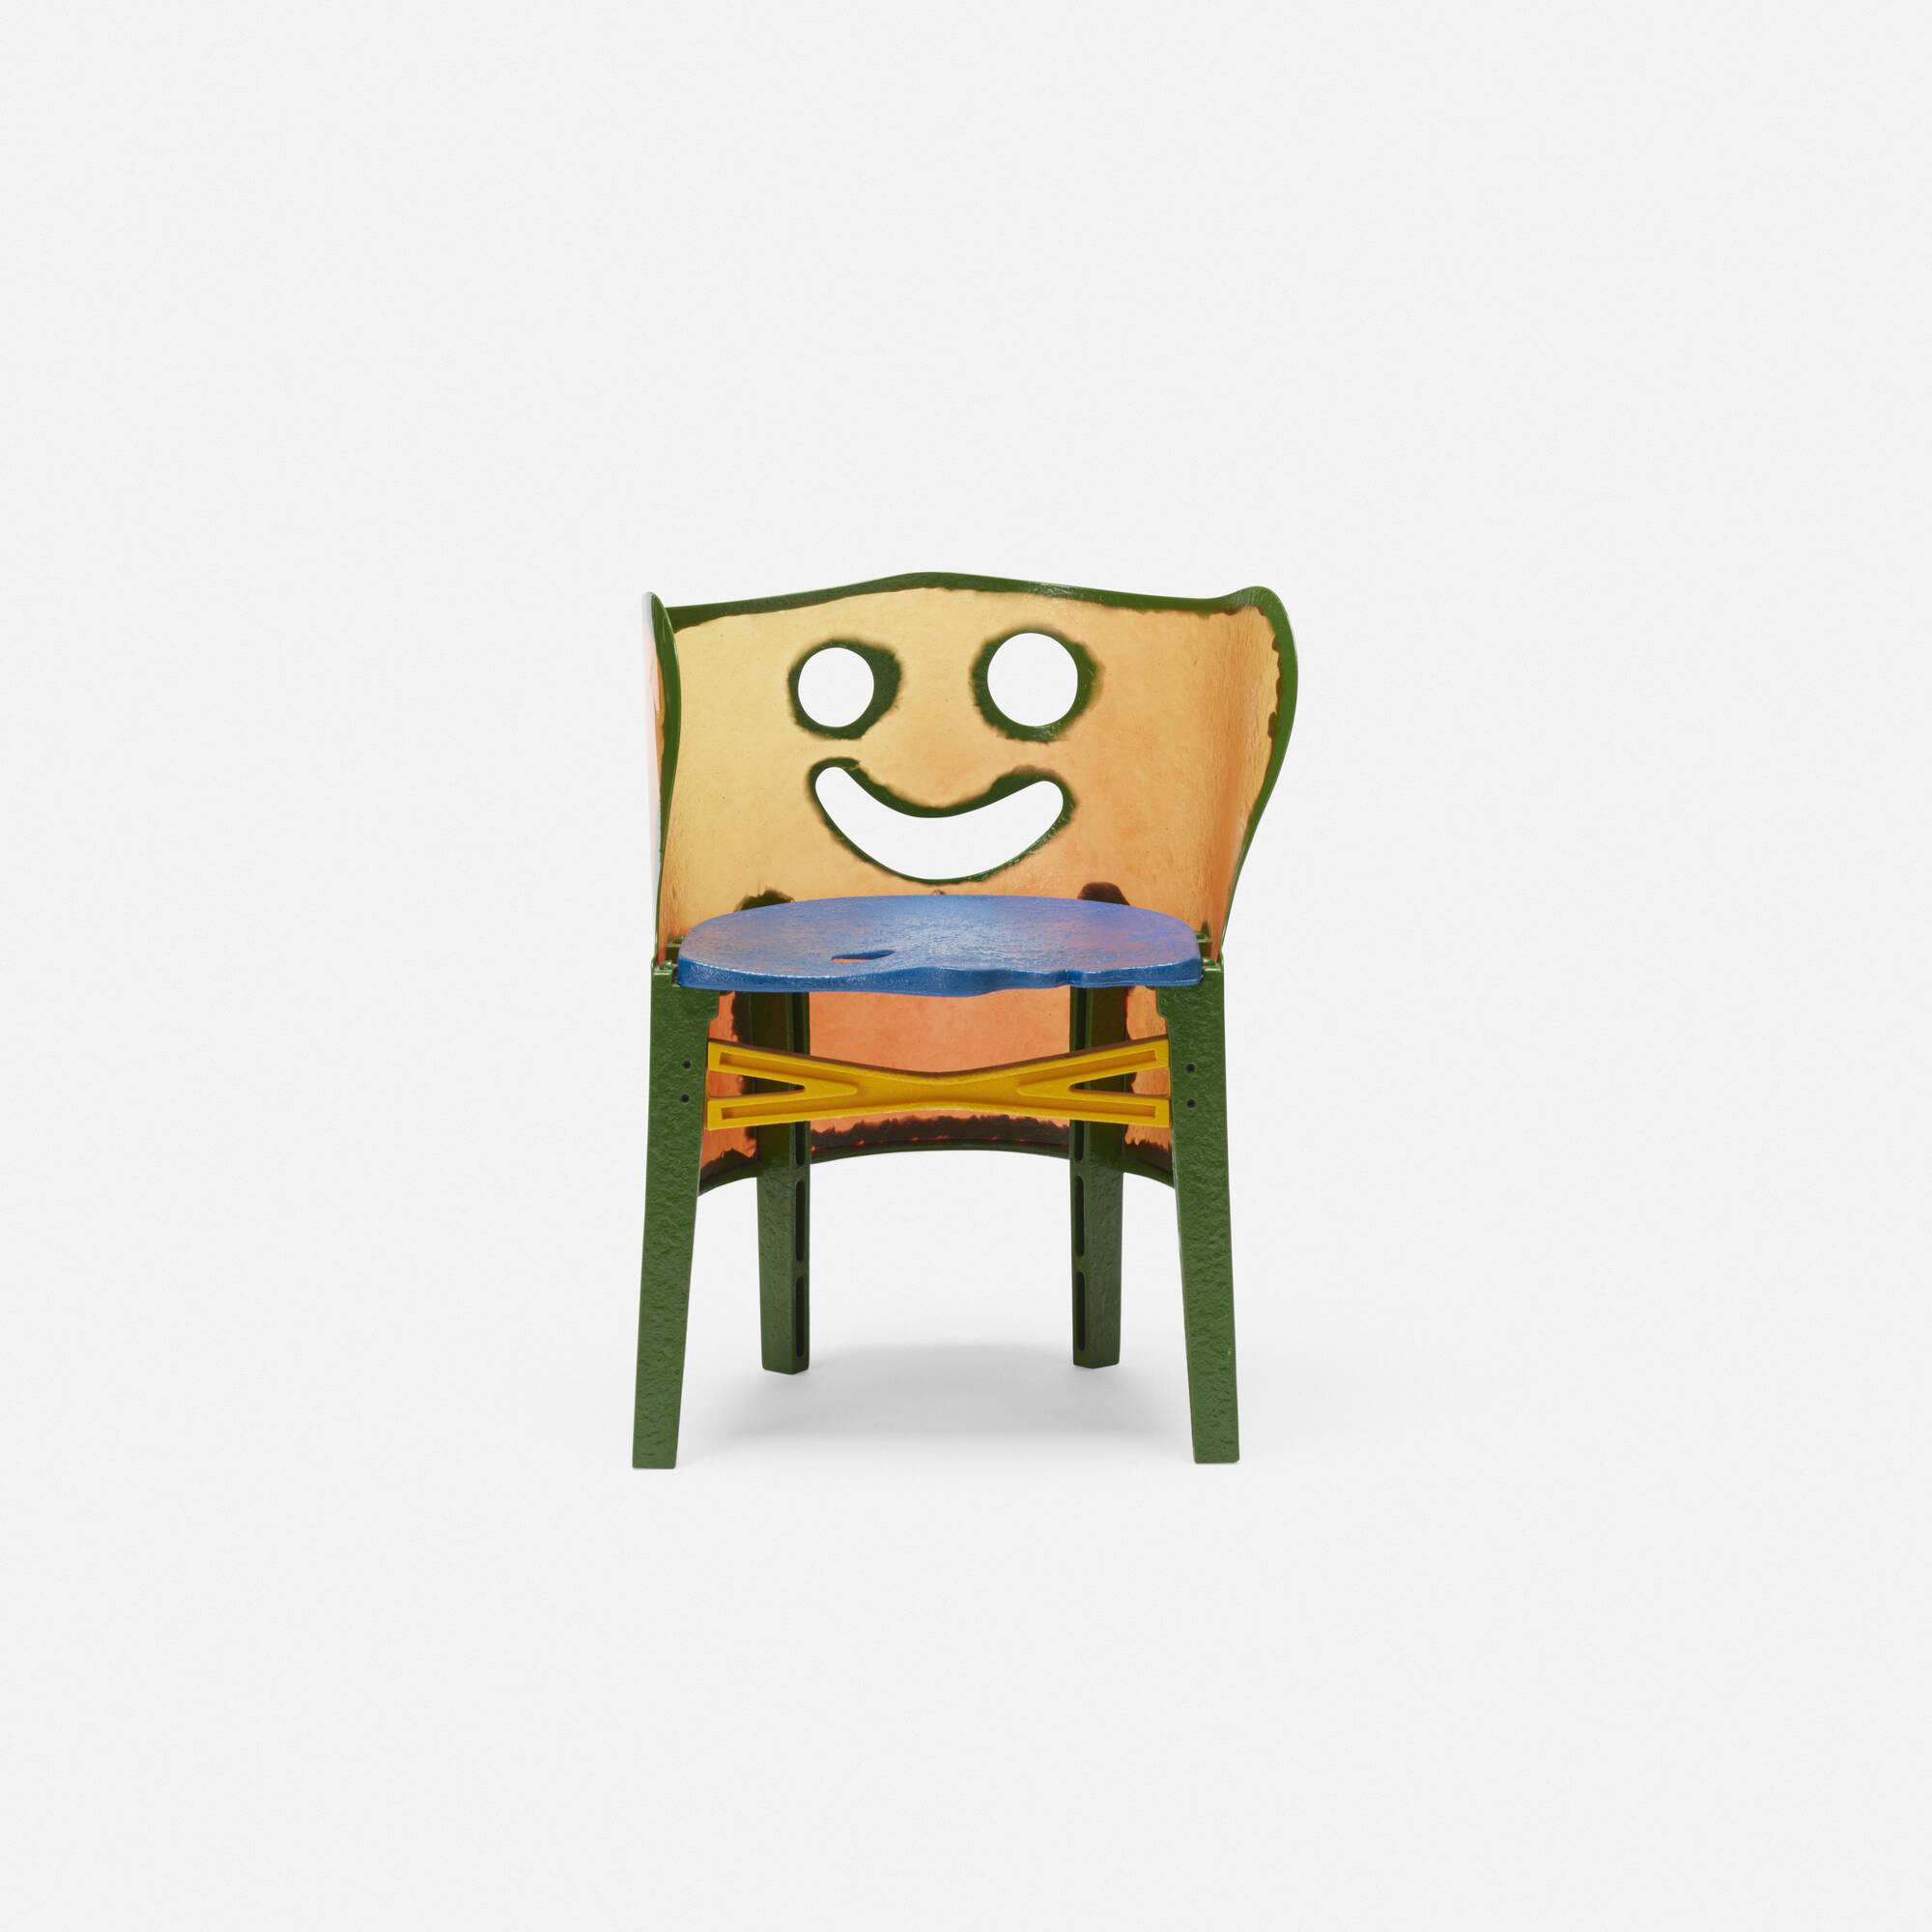 660: Gaetano Pesce / Crosby child's chair (2 of 3)